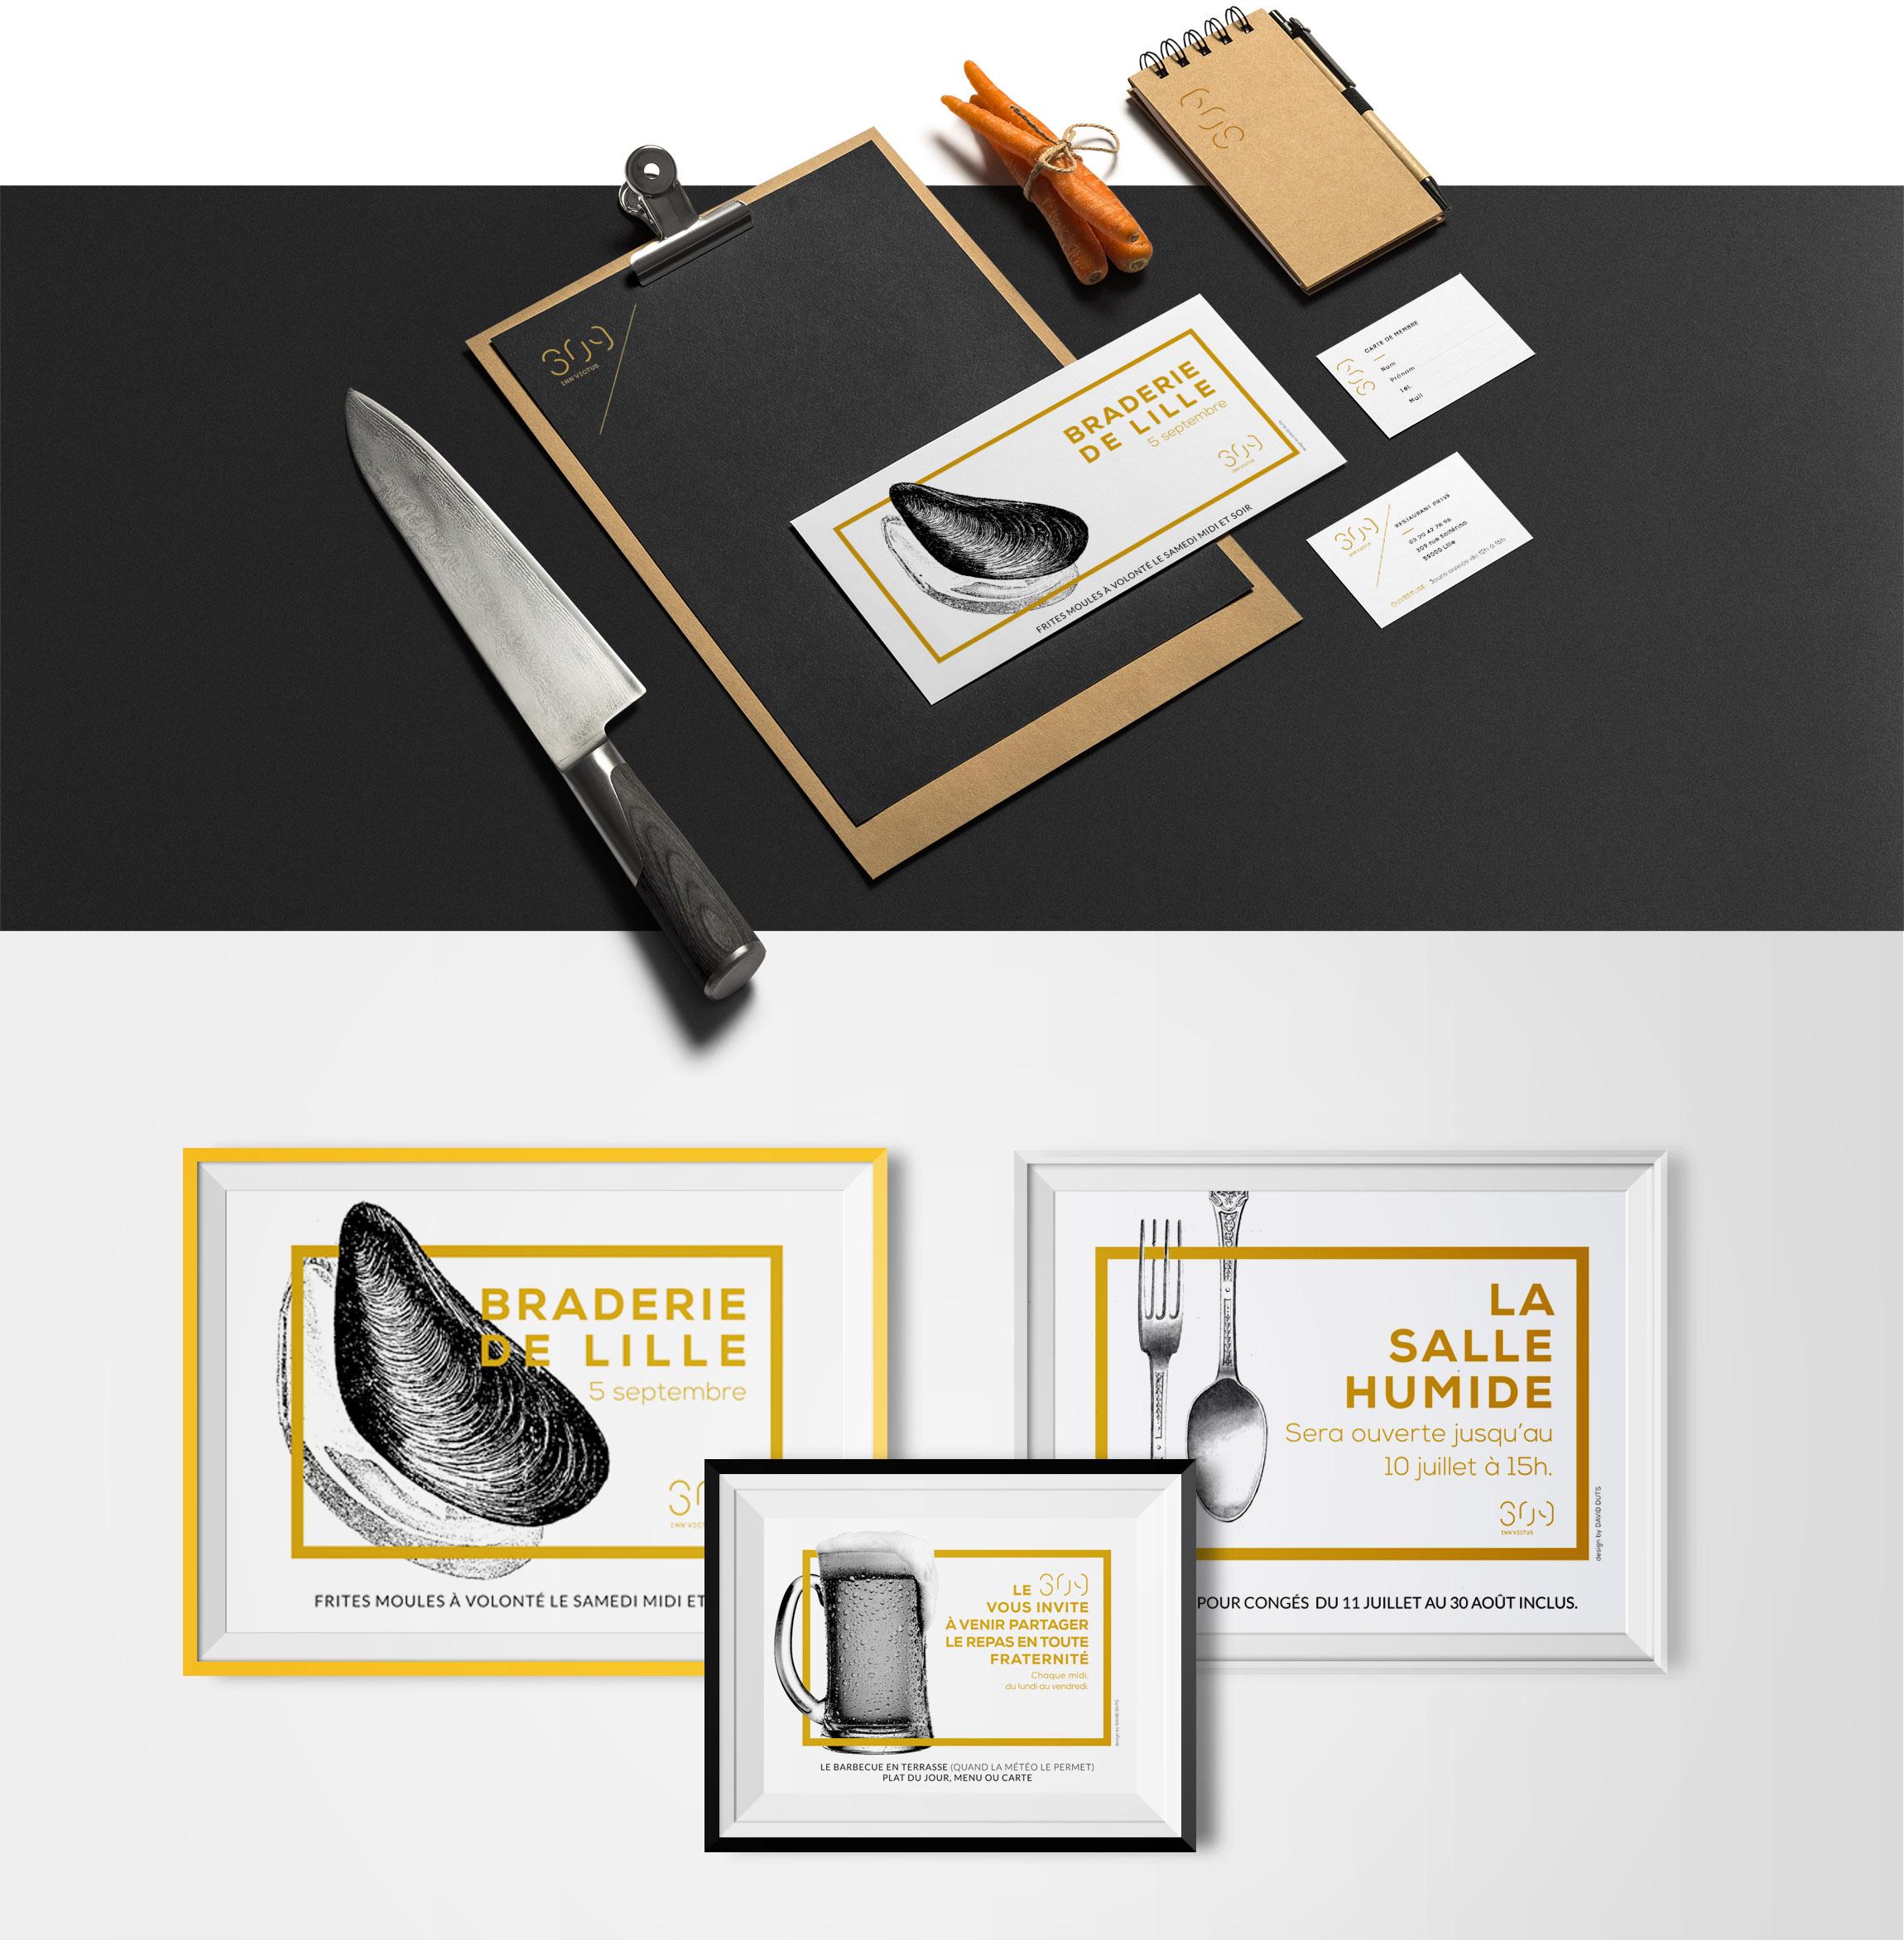 309_restaurant_privé_image-de-marque_bimbamboum_design_graphique_lille_situ_affiches